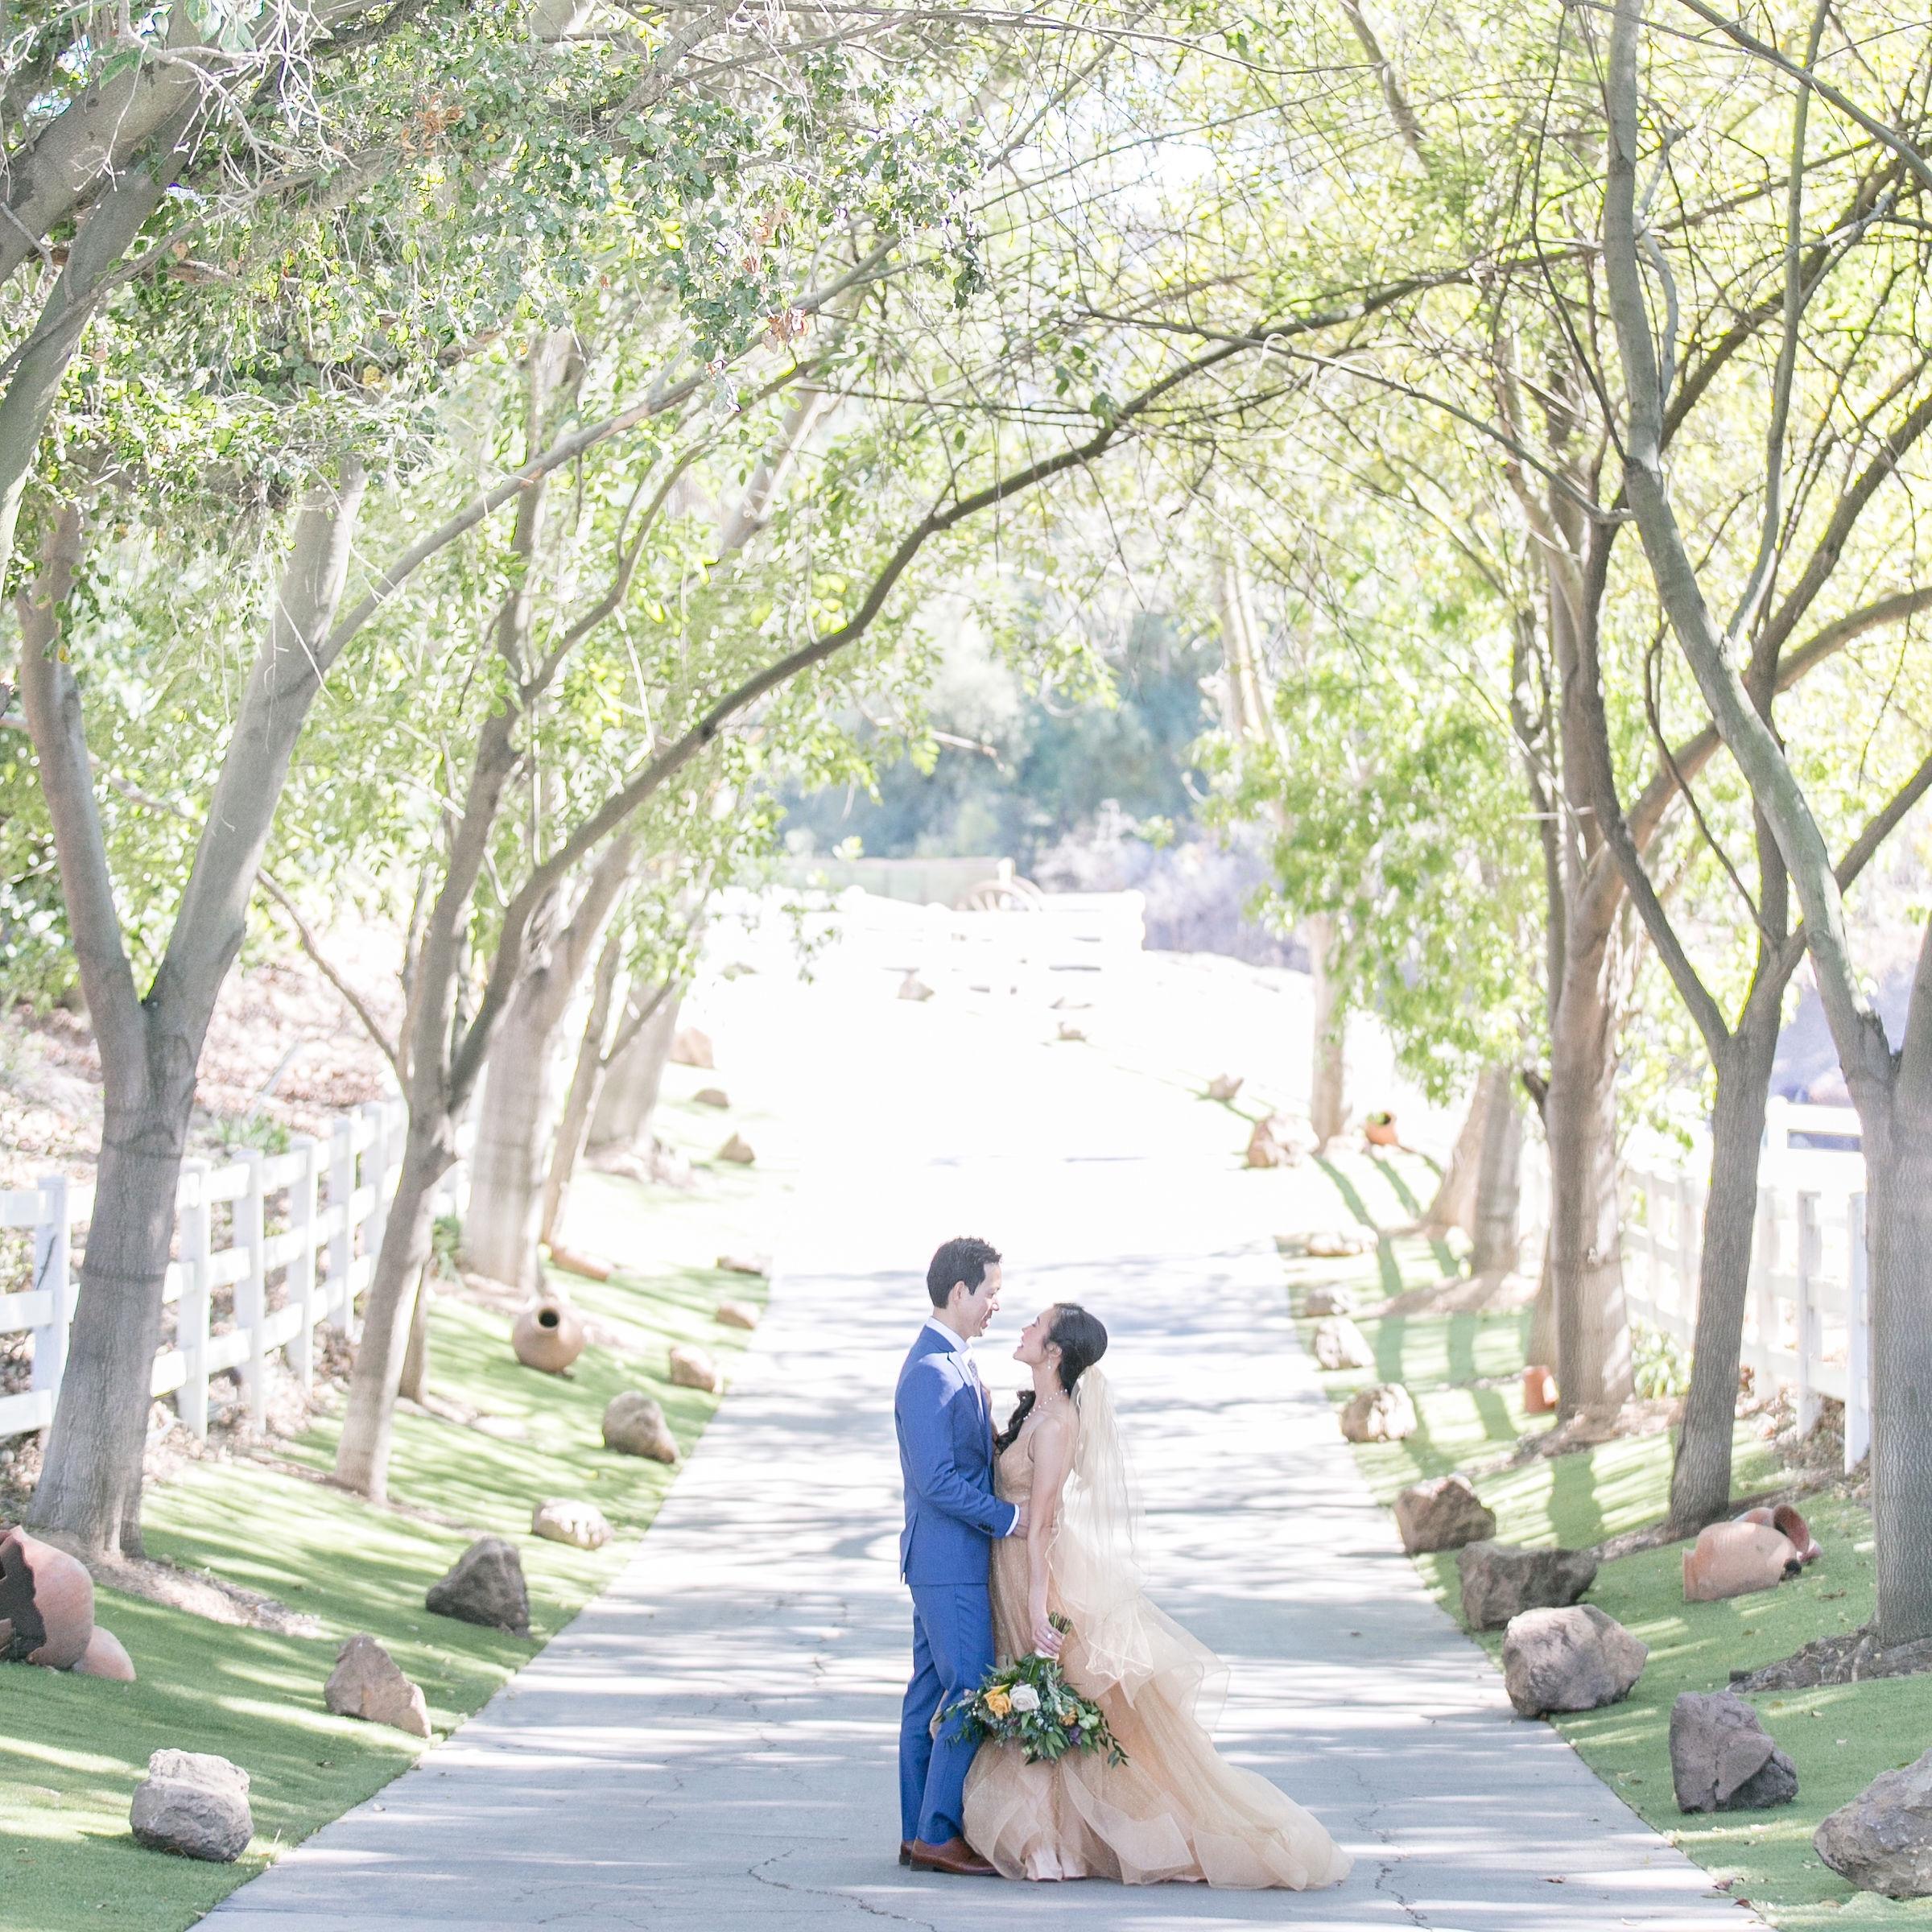 Melanie+Seiji-saddlerockranch-malibucaliforniawedding-couplesportraitsandweddingparty-0207.jpg